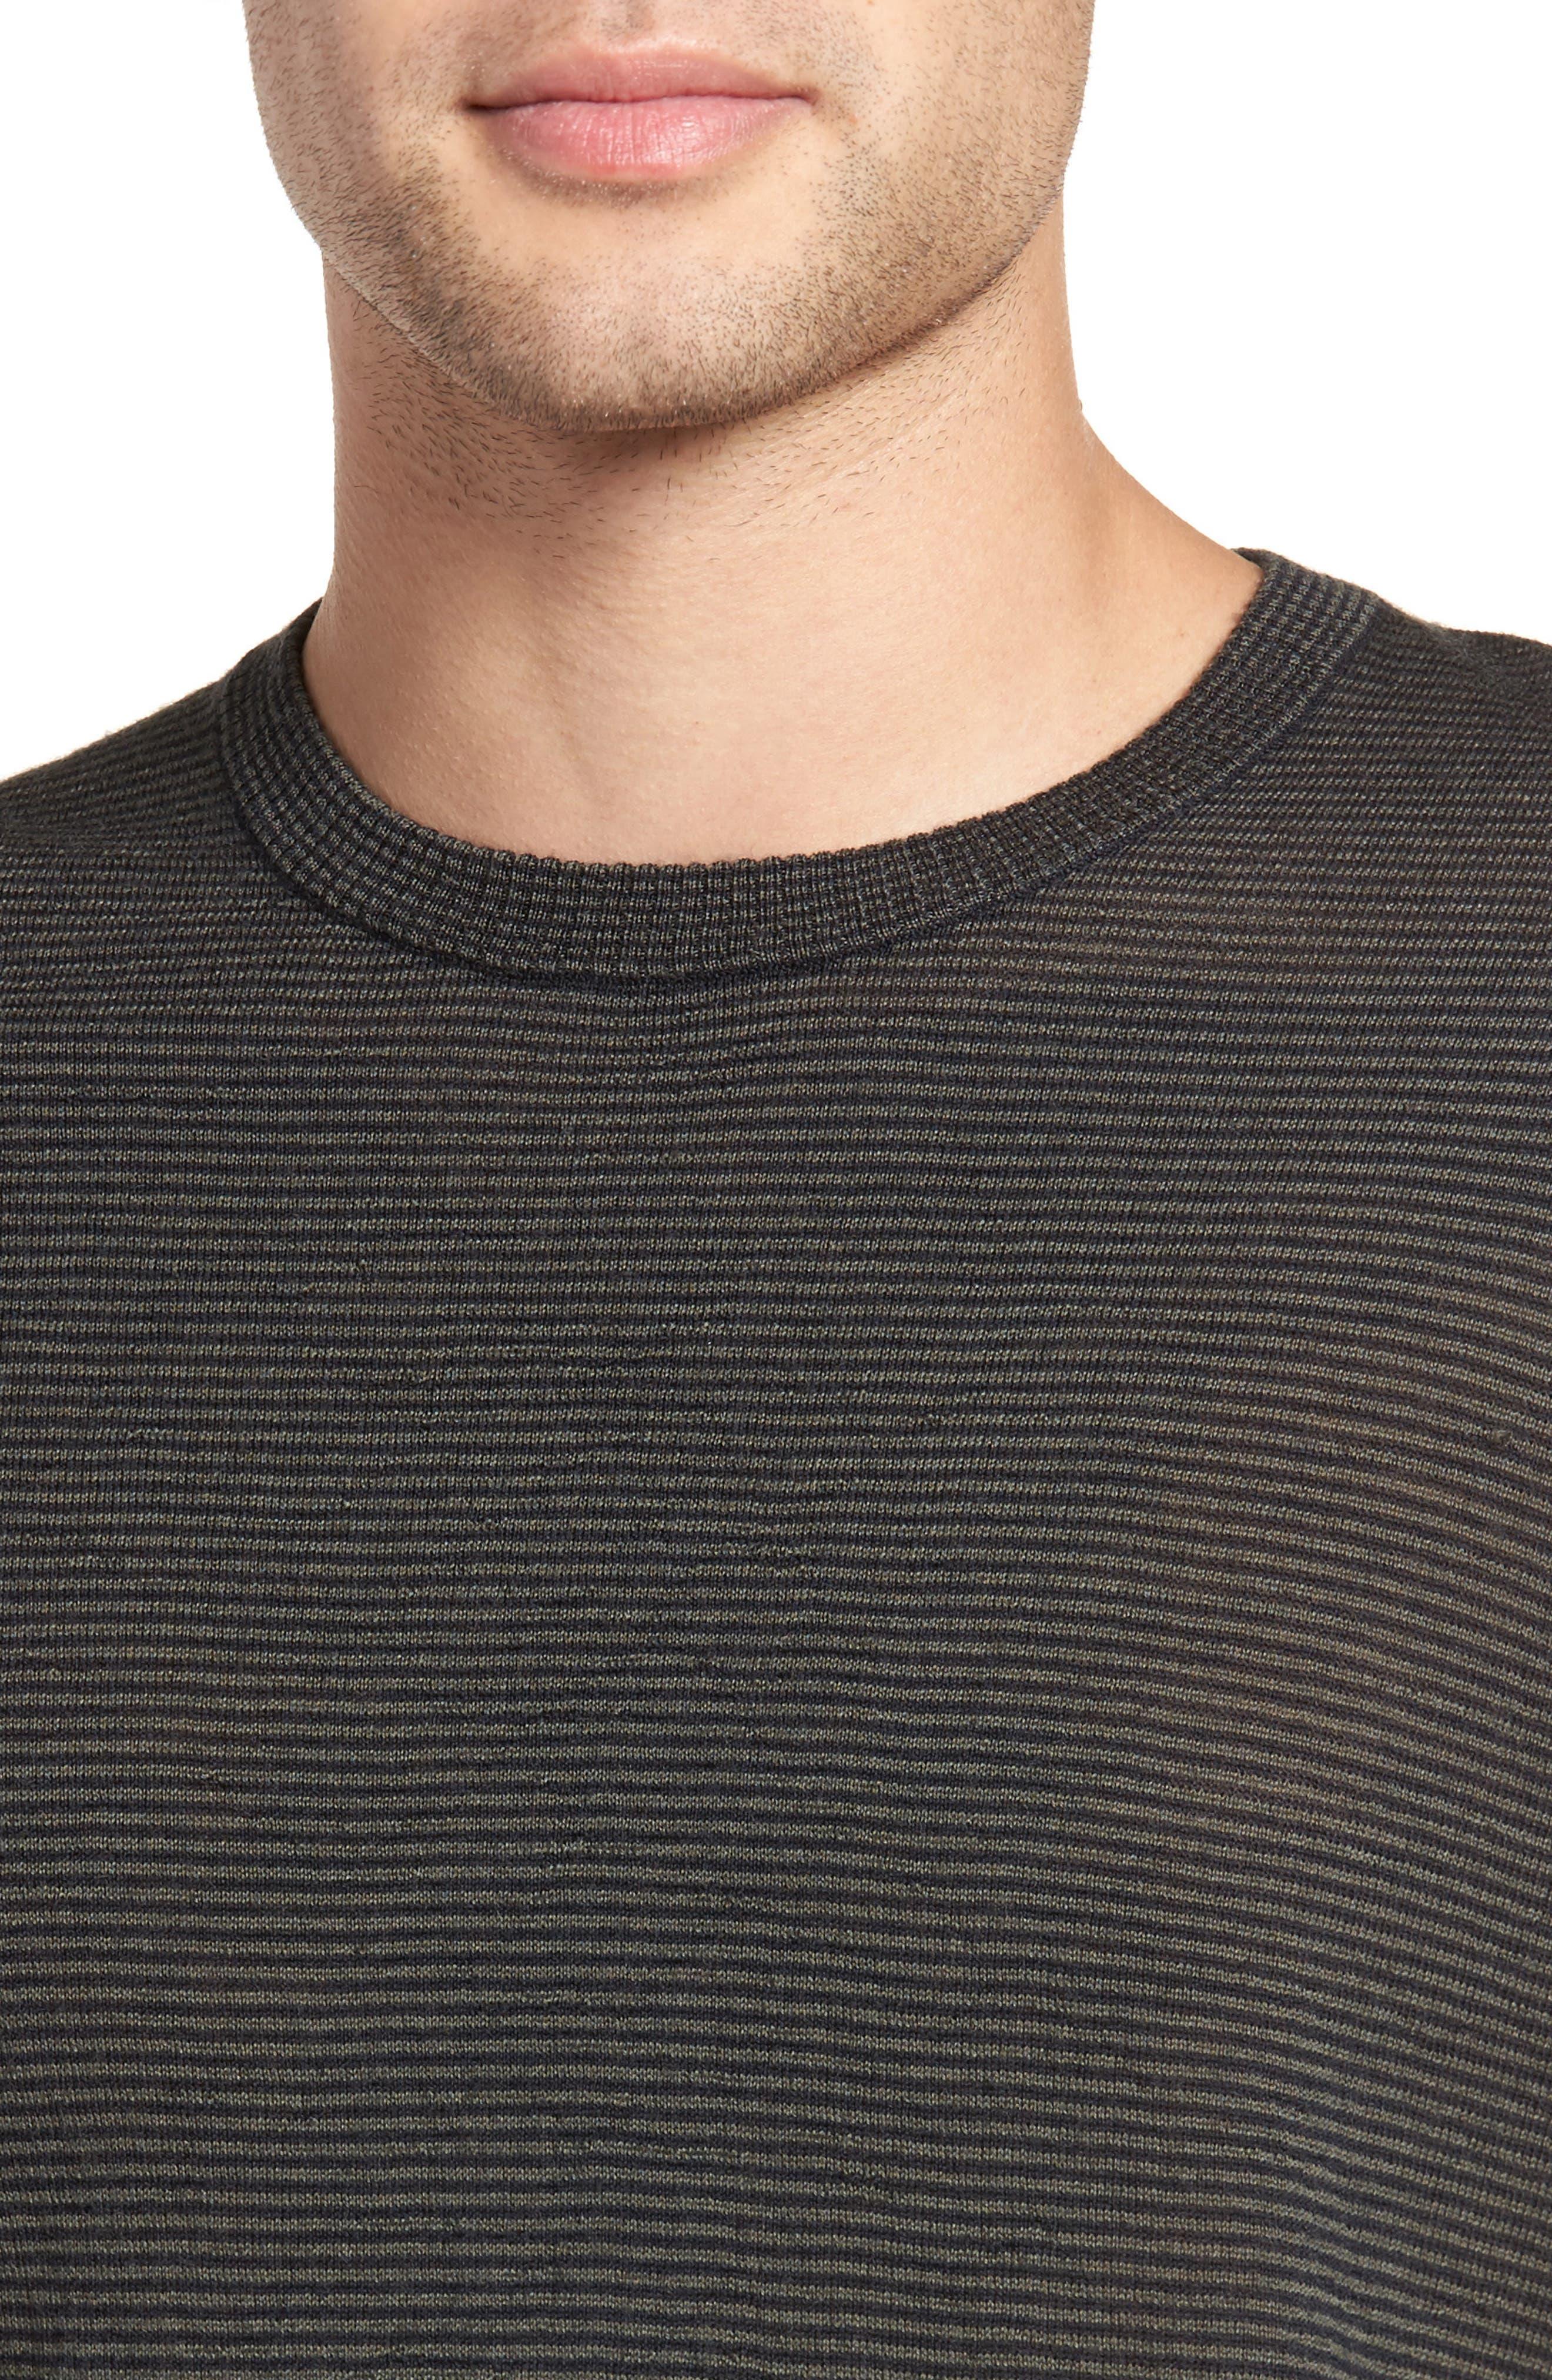 Regular Fit Pinstripe Wool Sweater,                             Alternate thumbnail 4, color,                             New Coastal/ H Charcoal